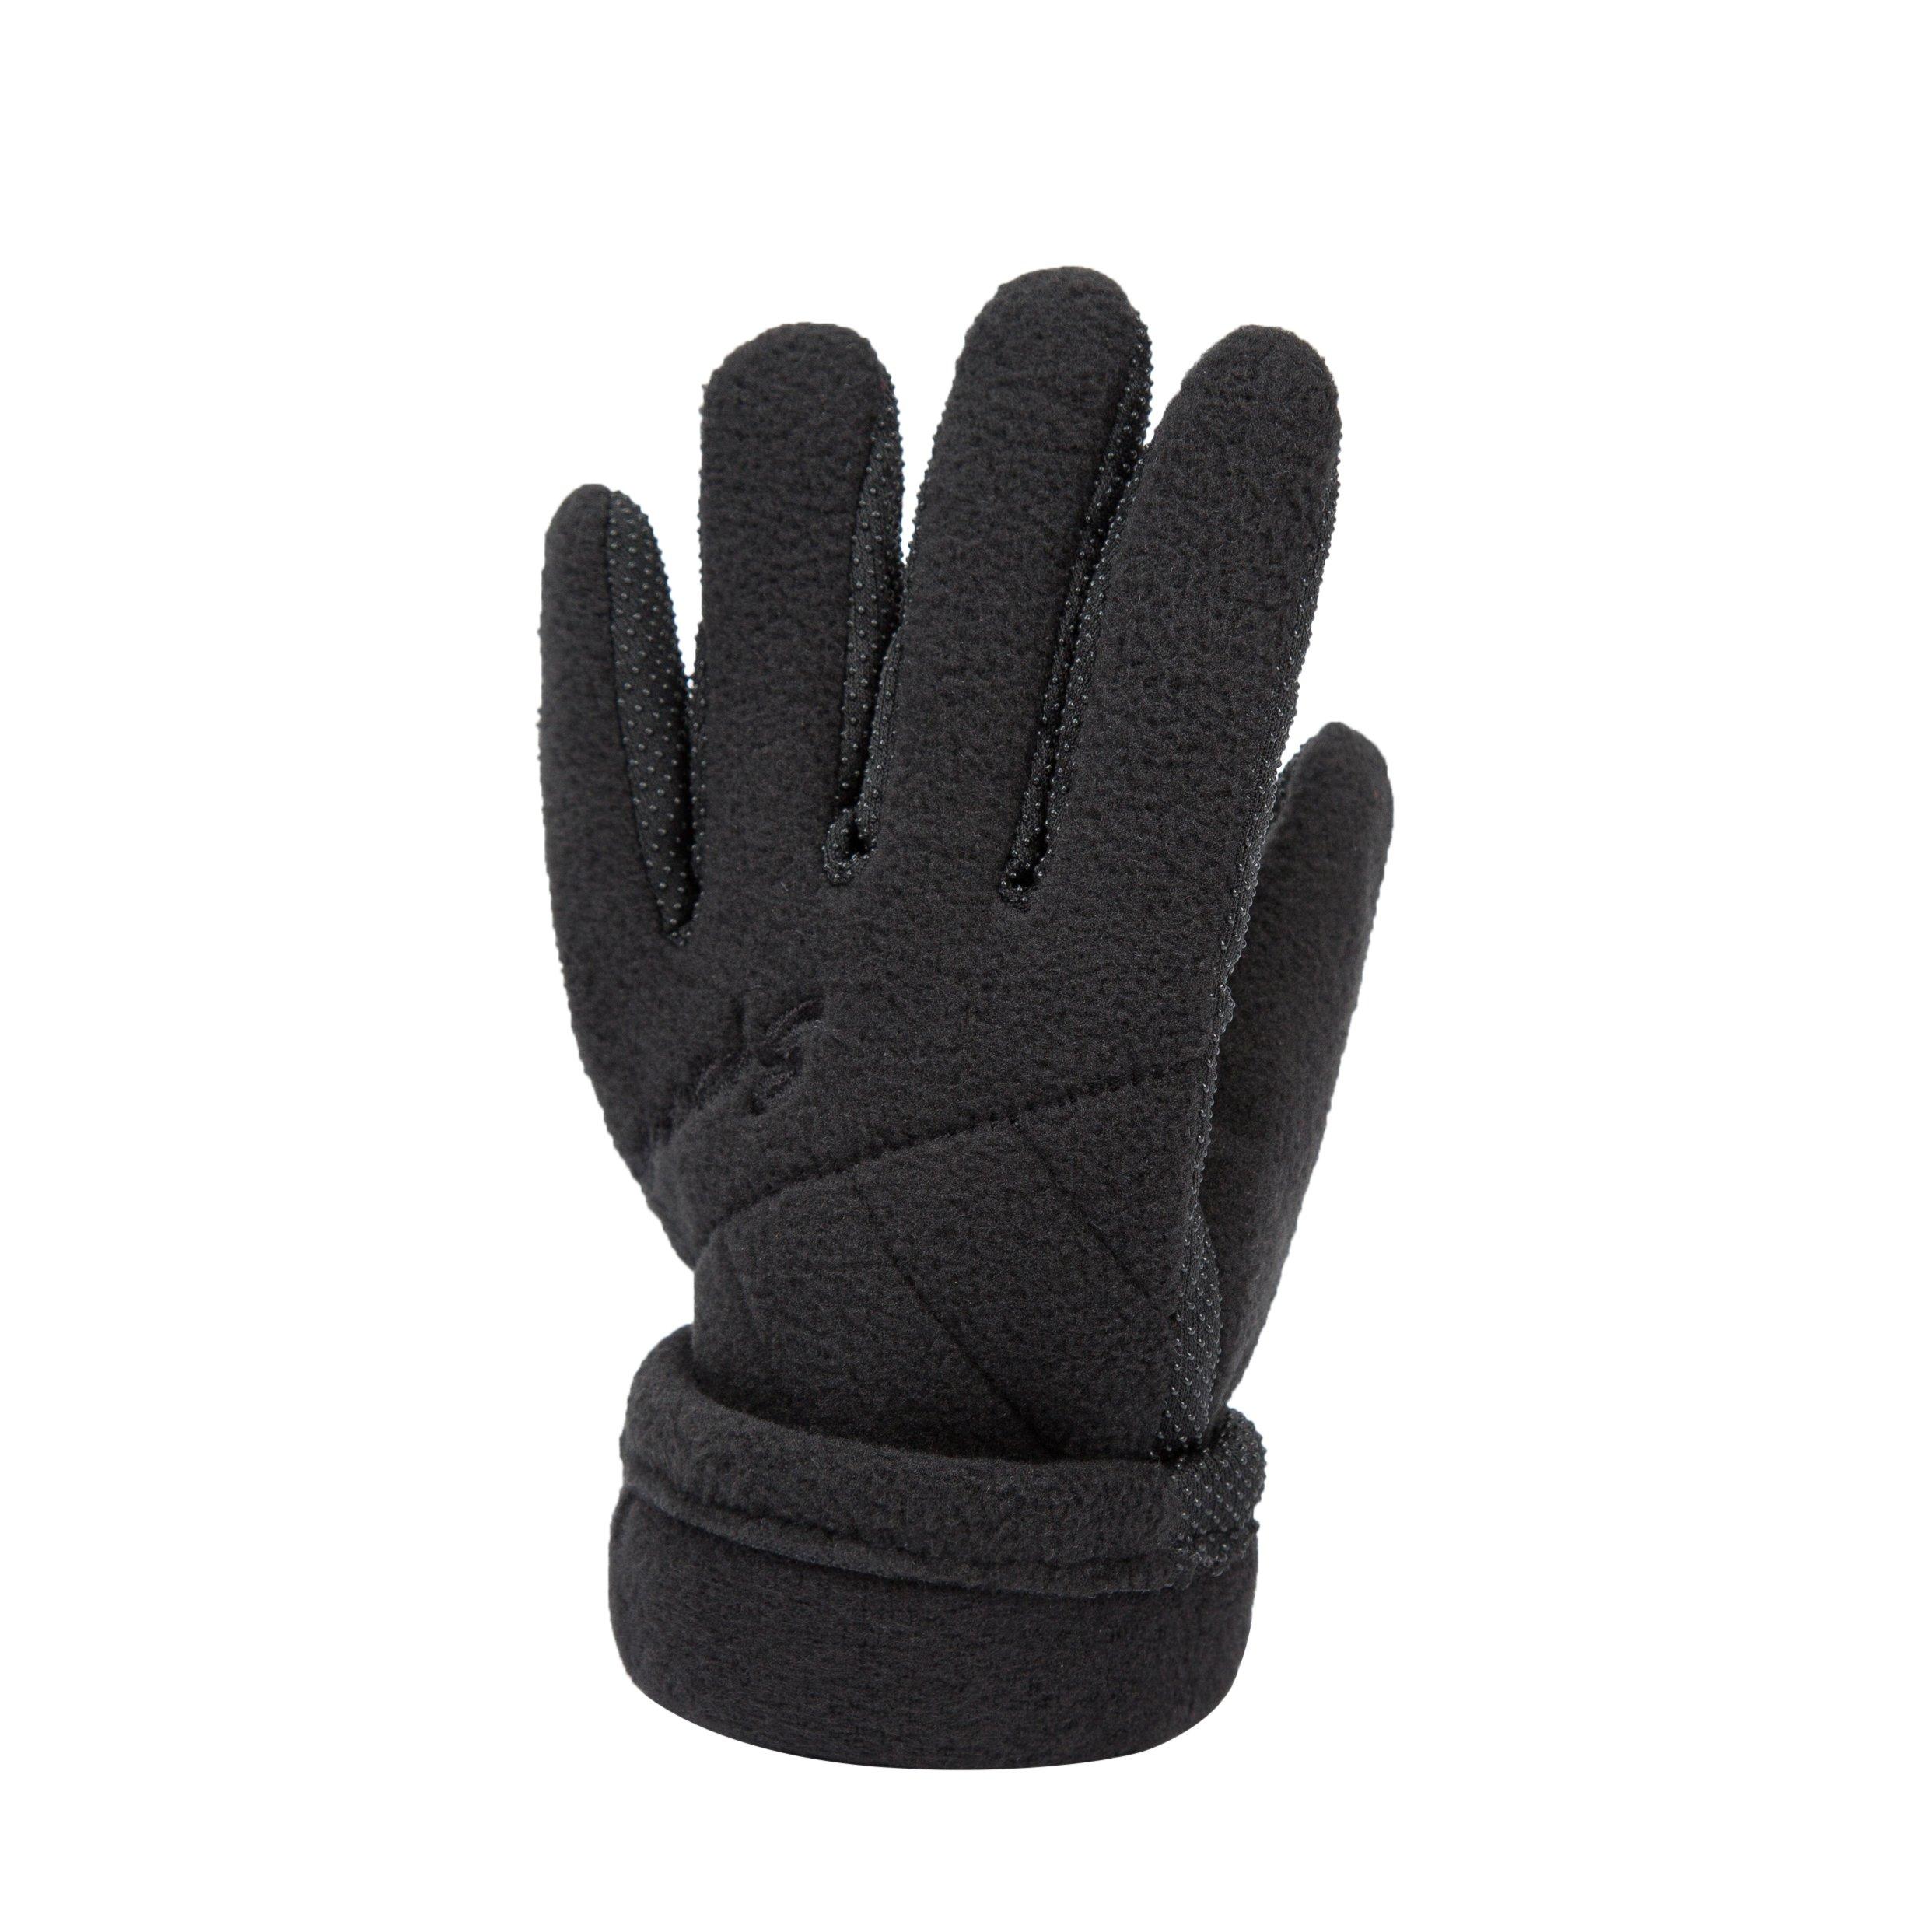 Black Boy girls Women Winter Gloves Anti Slip Fleece Lining For Hiding Snowboard Driving Ski by KimmyKu (Image #2)